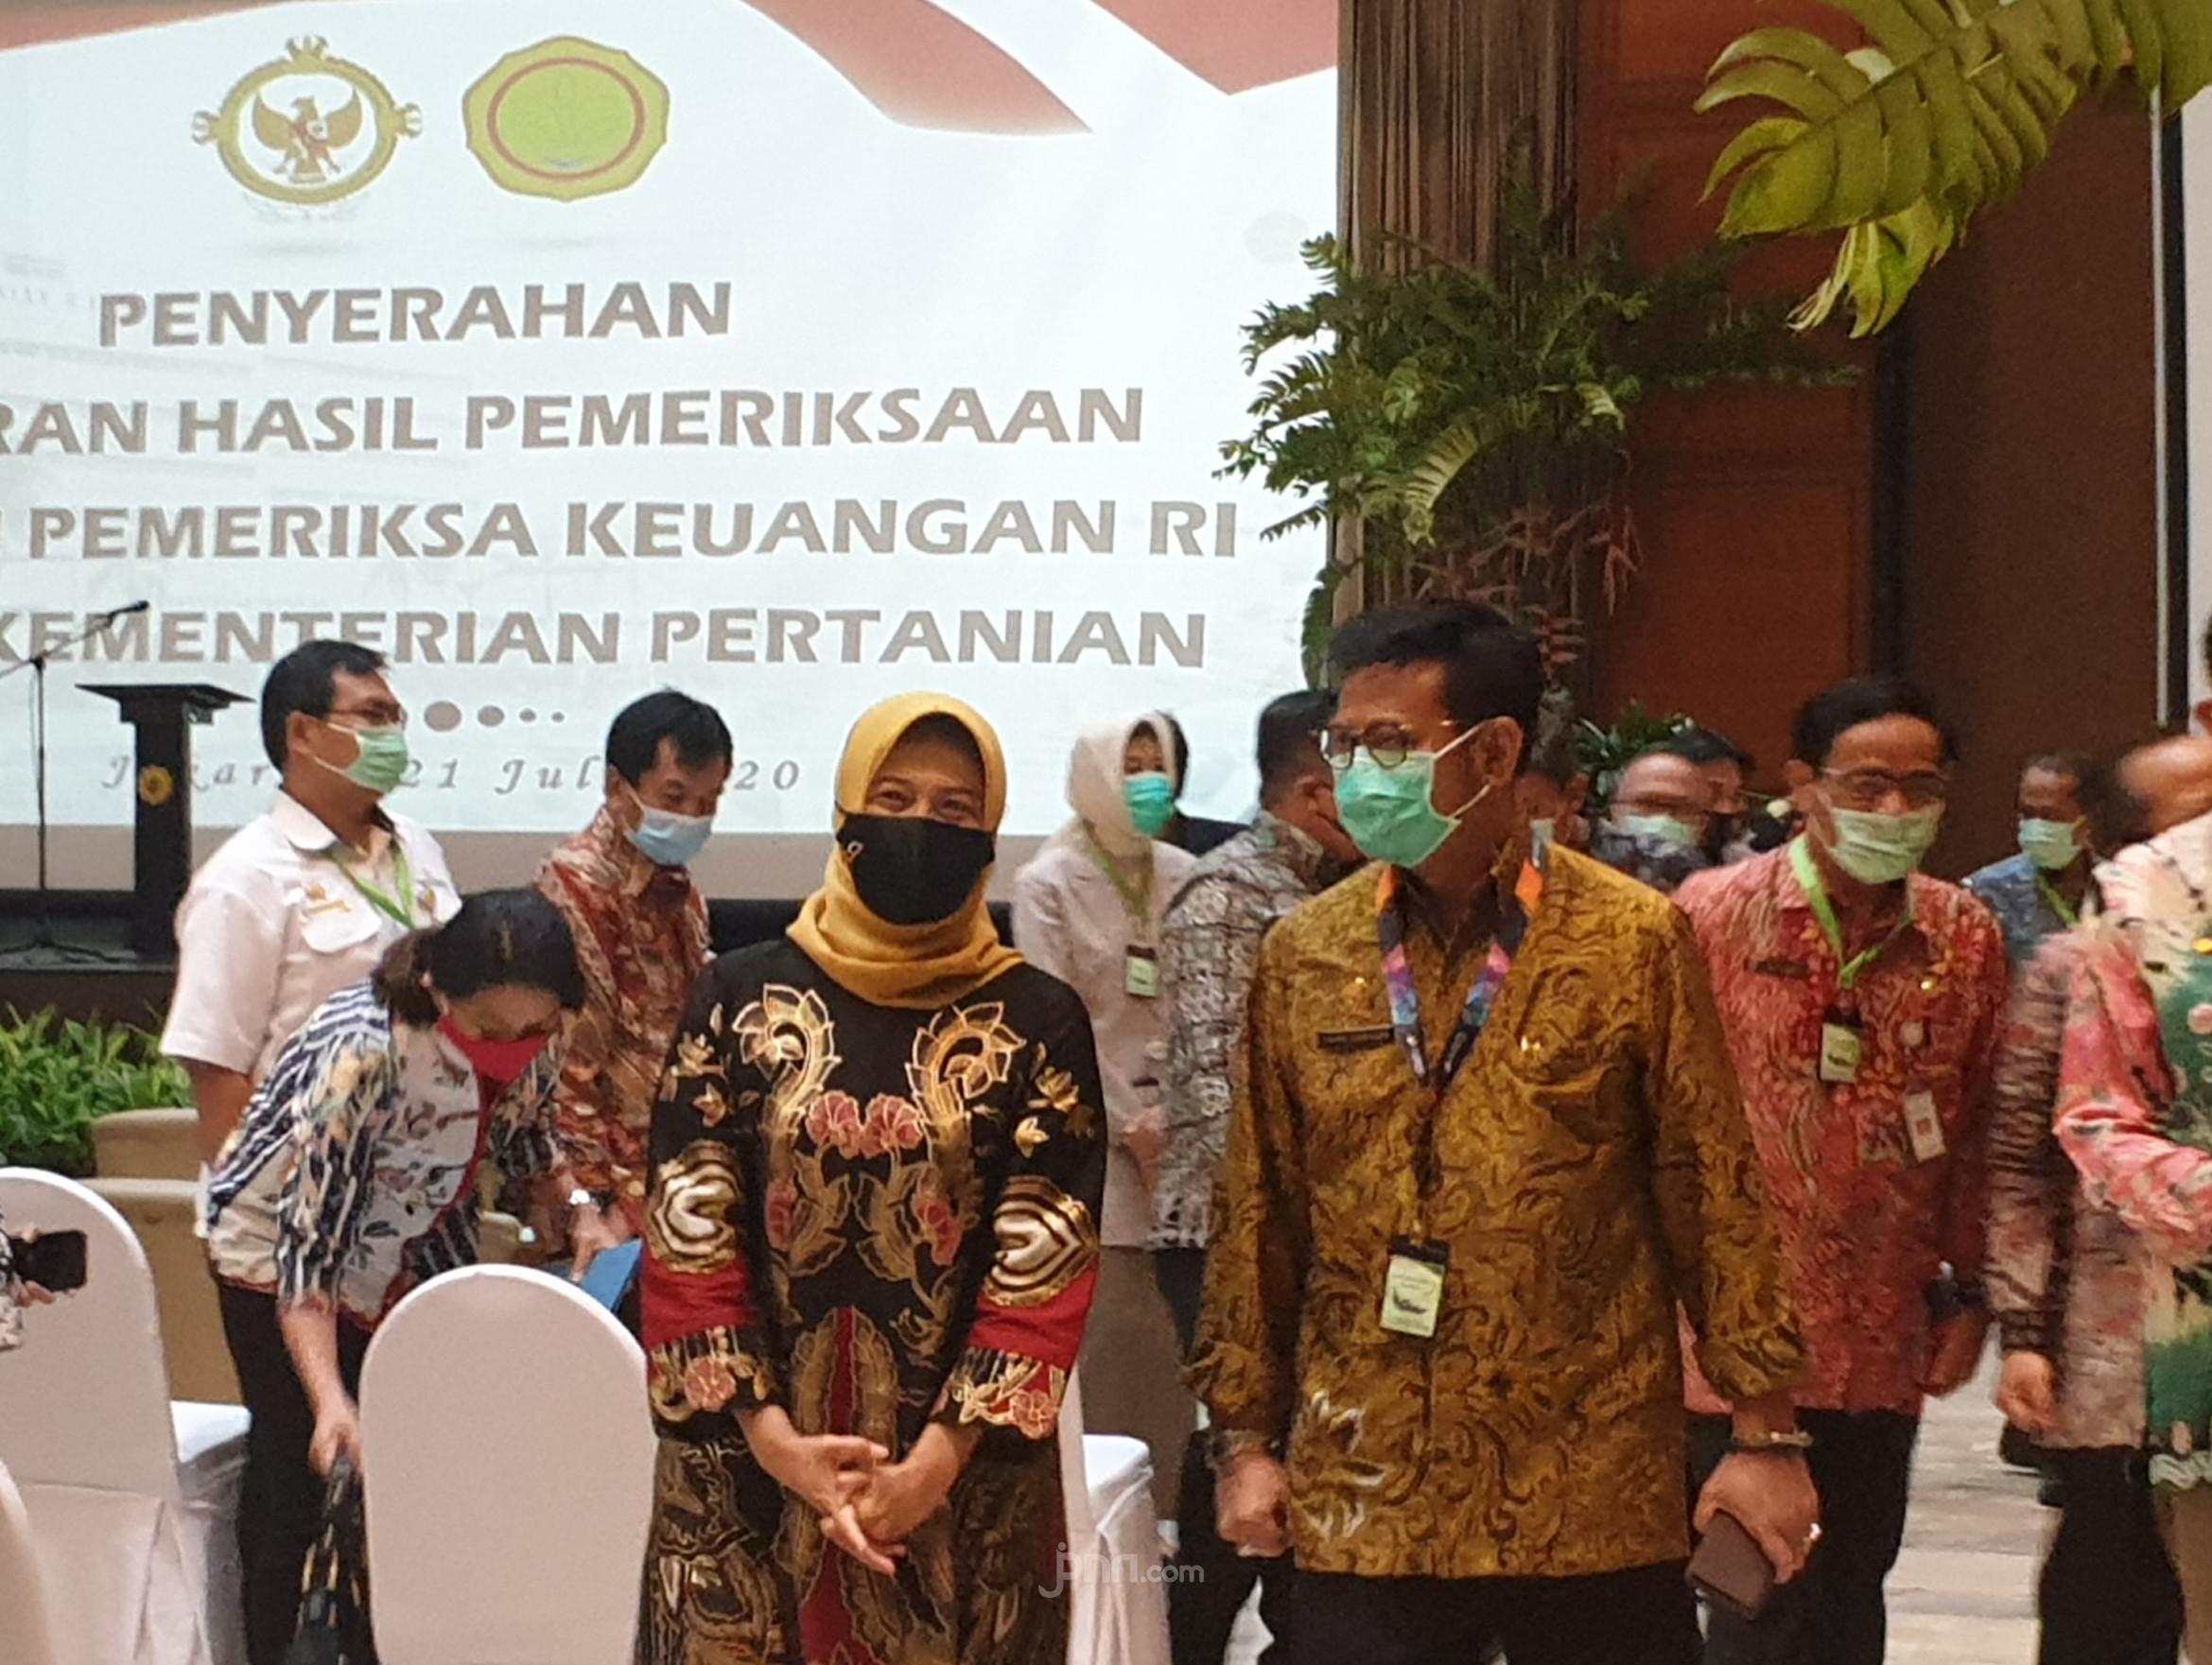 Mentan Syahrul Yasin Limpo: Hari Ini Saya Bangga - JPNN.com